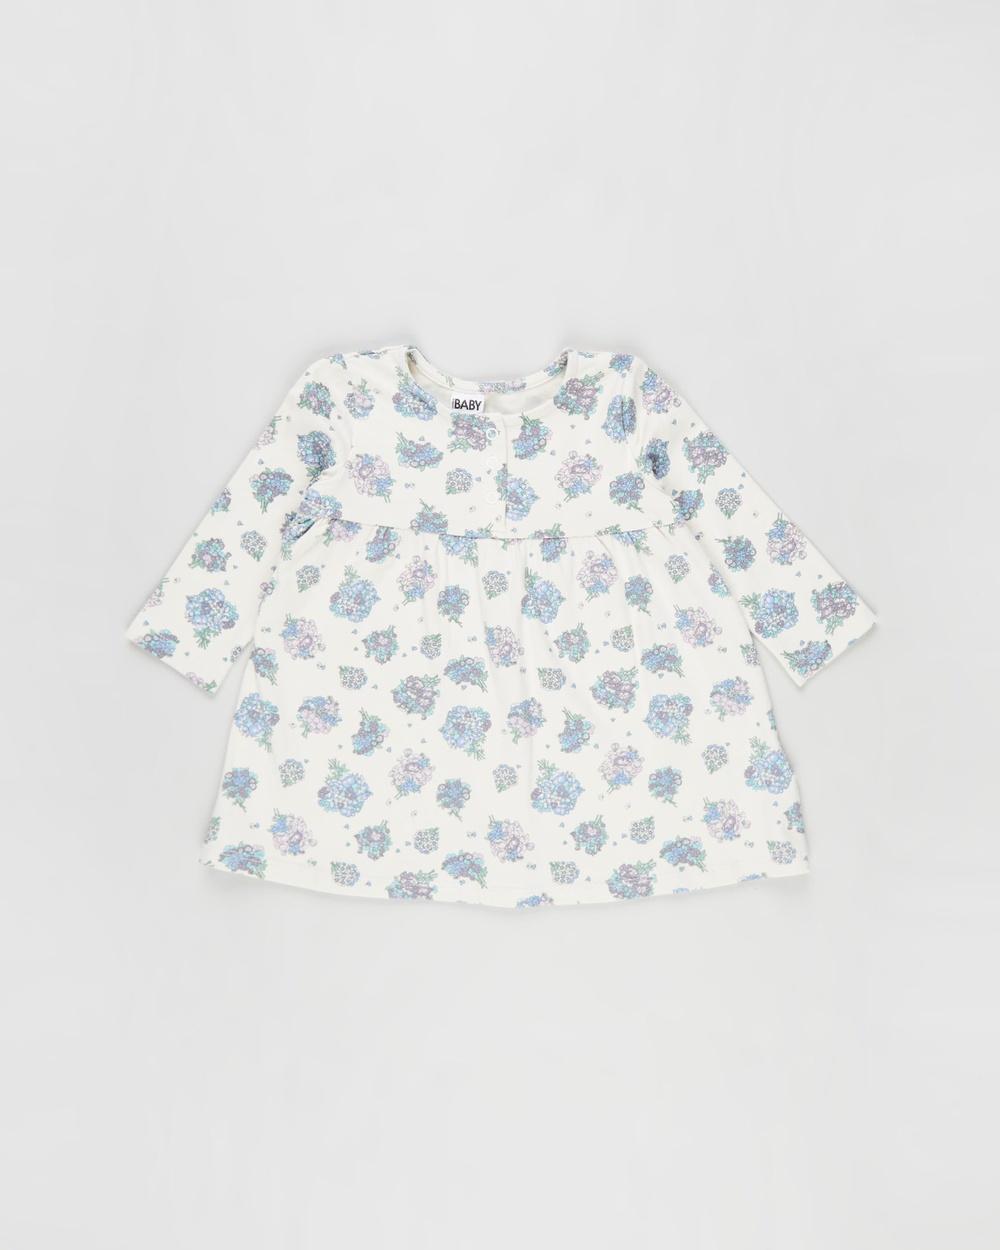 Cotton On Baby Molly Long Sleeve Dress Babies Dresses Dark Vanilla & Dusk Purple Petunia Floral Australia